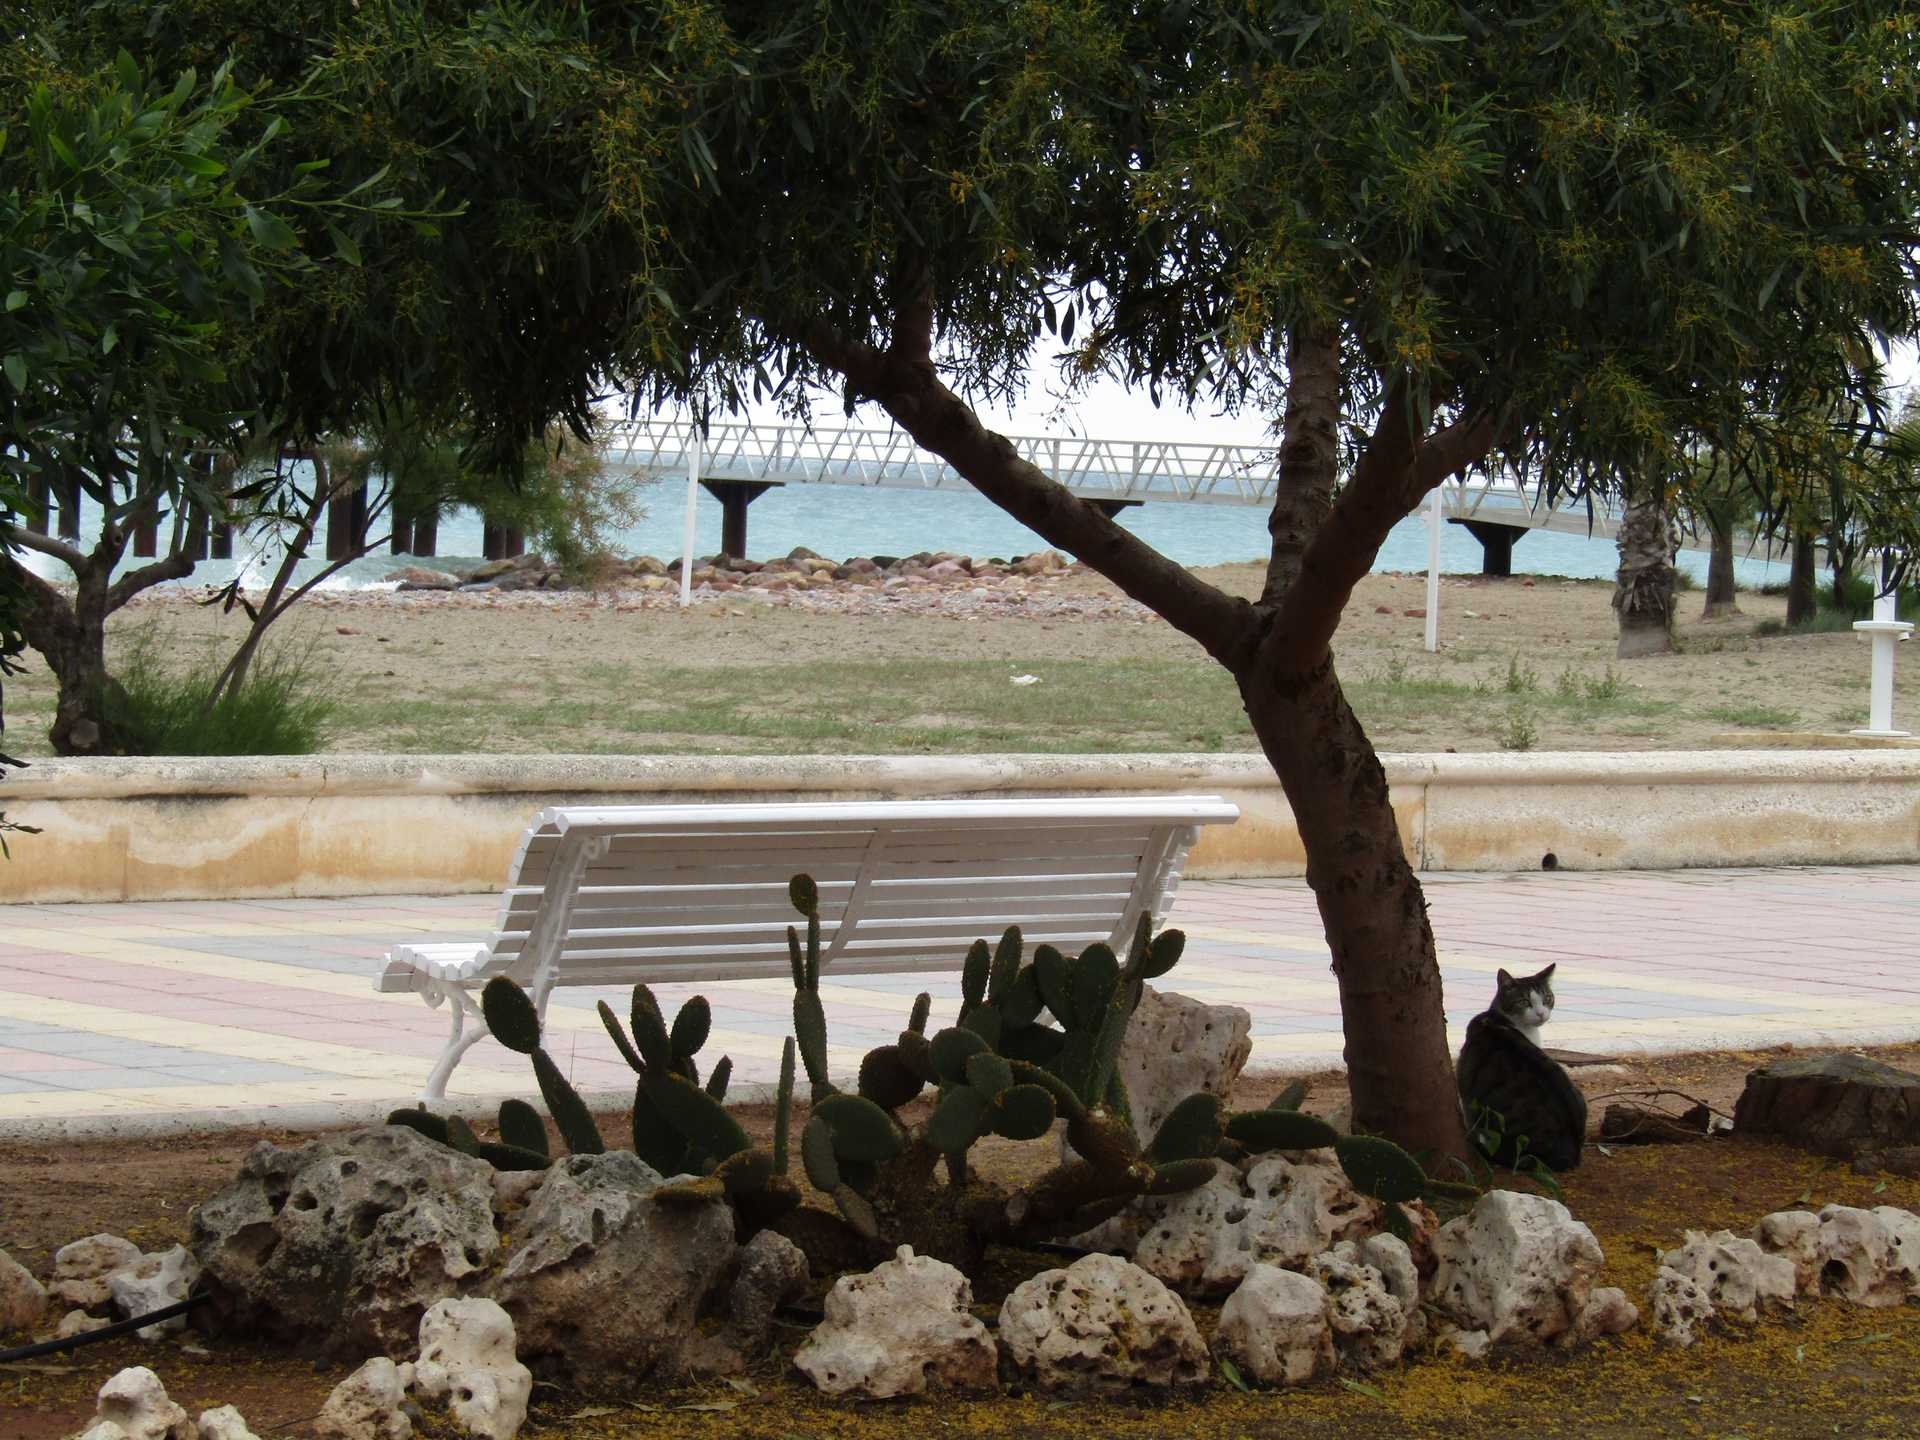 Passeig Marítim de Xilxes